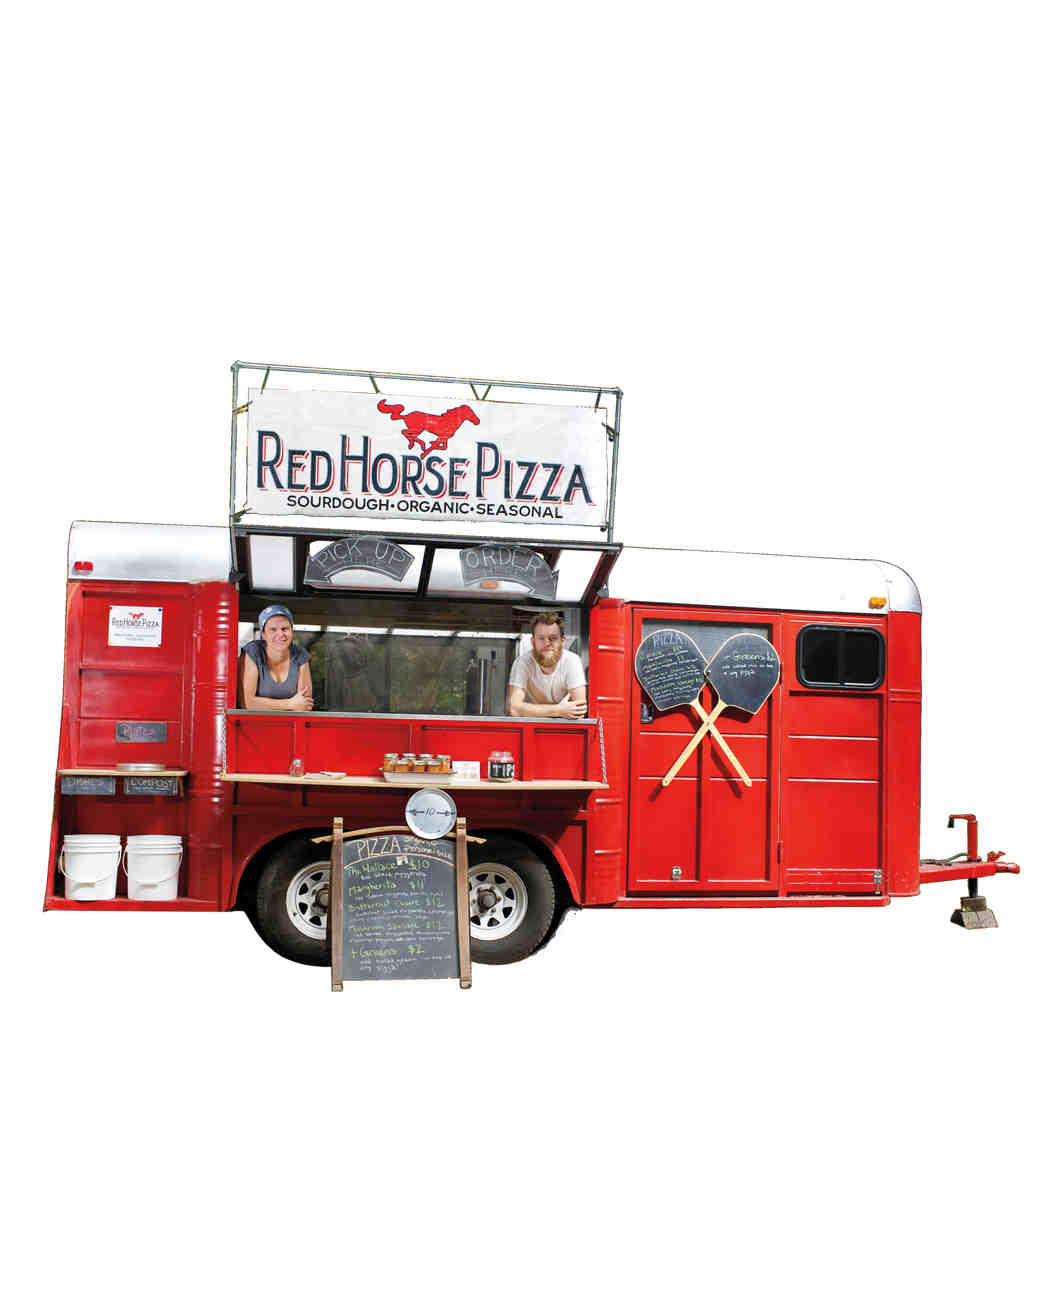 union-hill-redhorse-pizza-1-mwds110664-1114.jpg